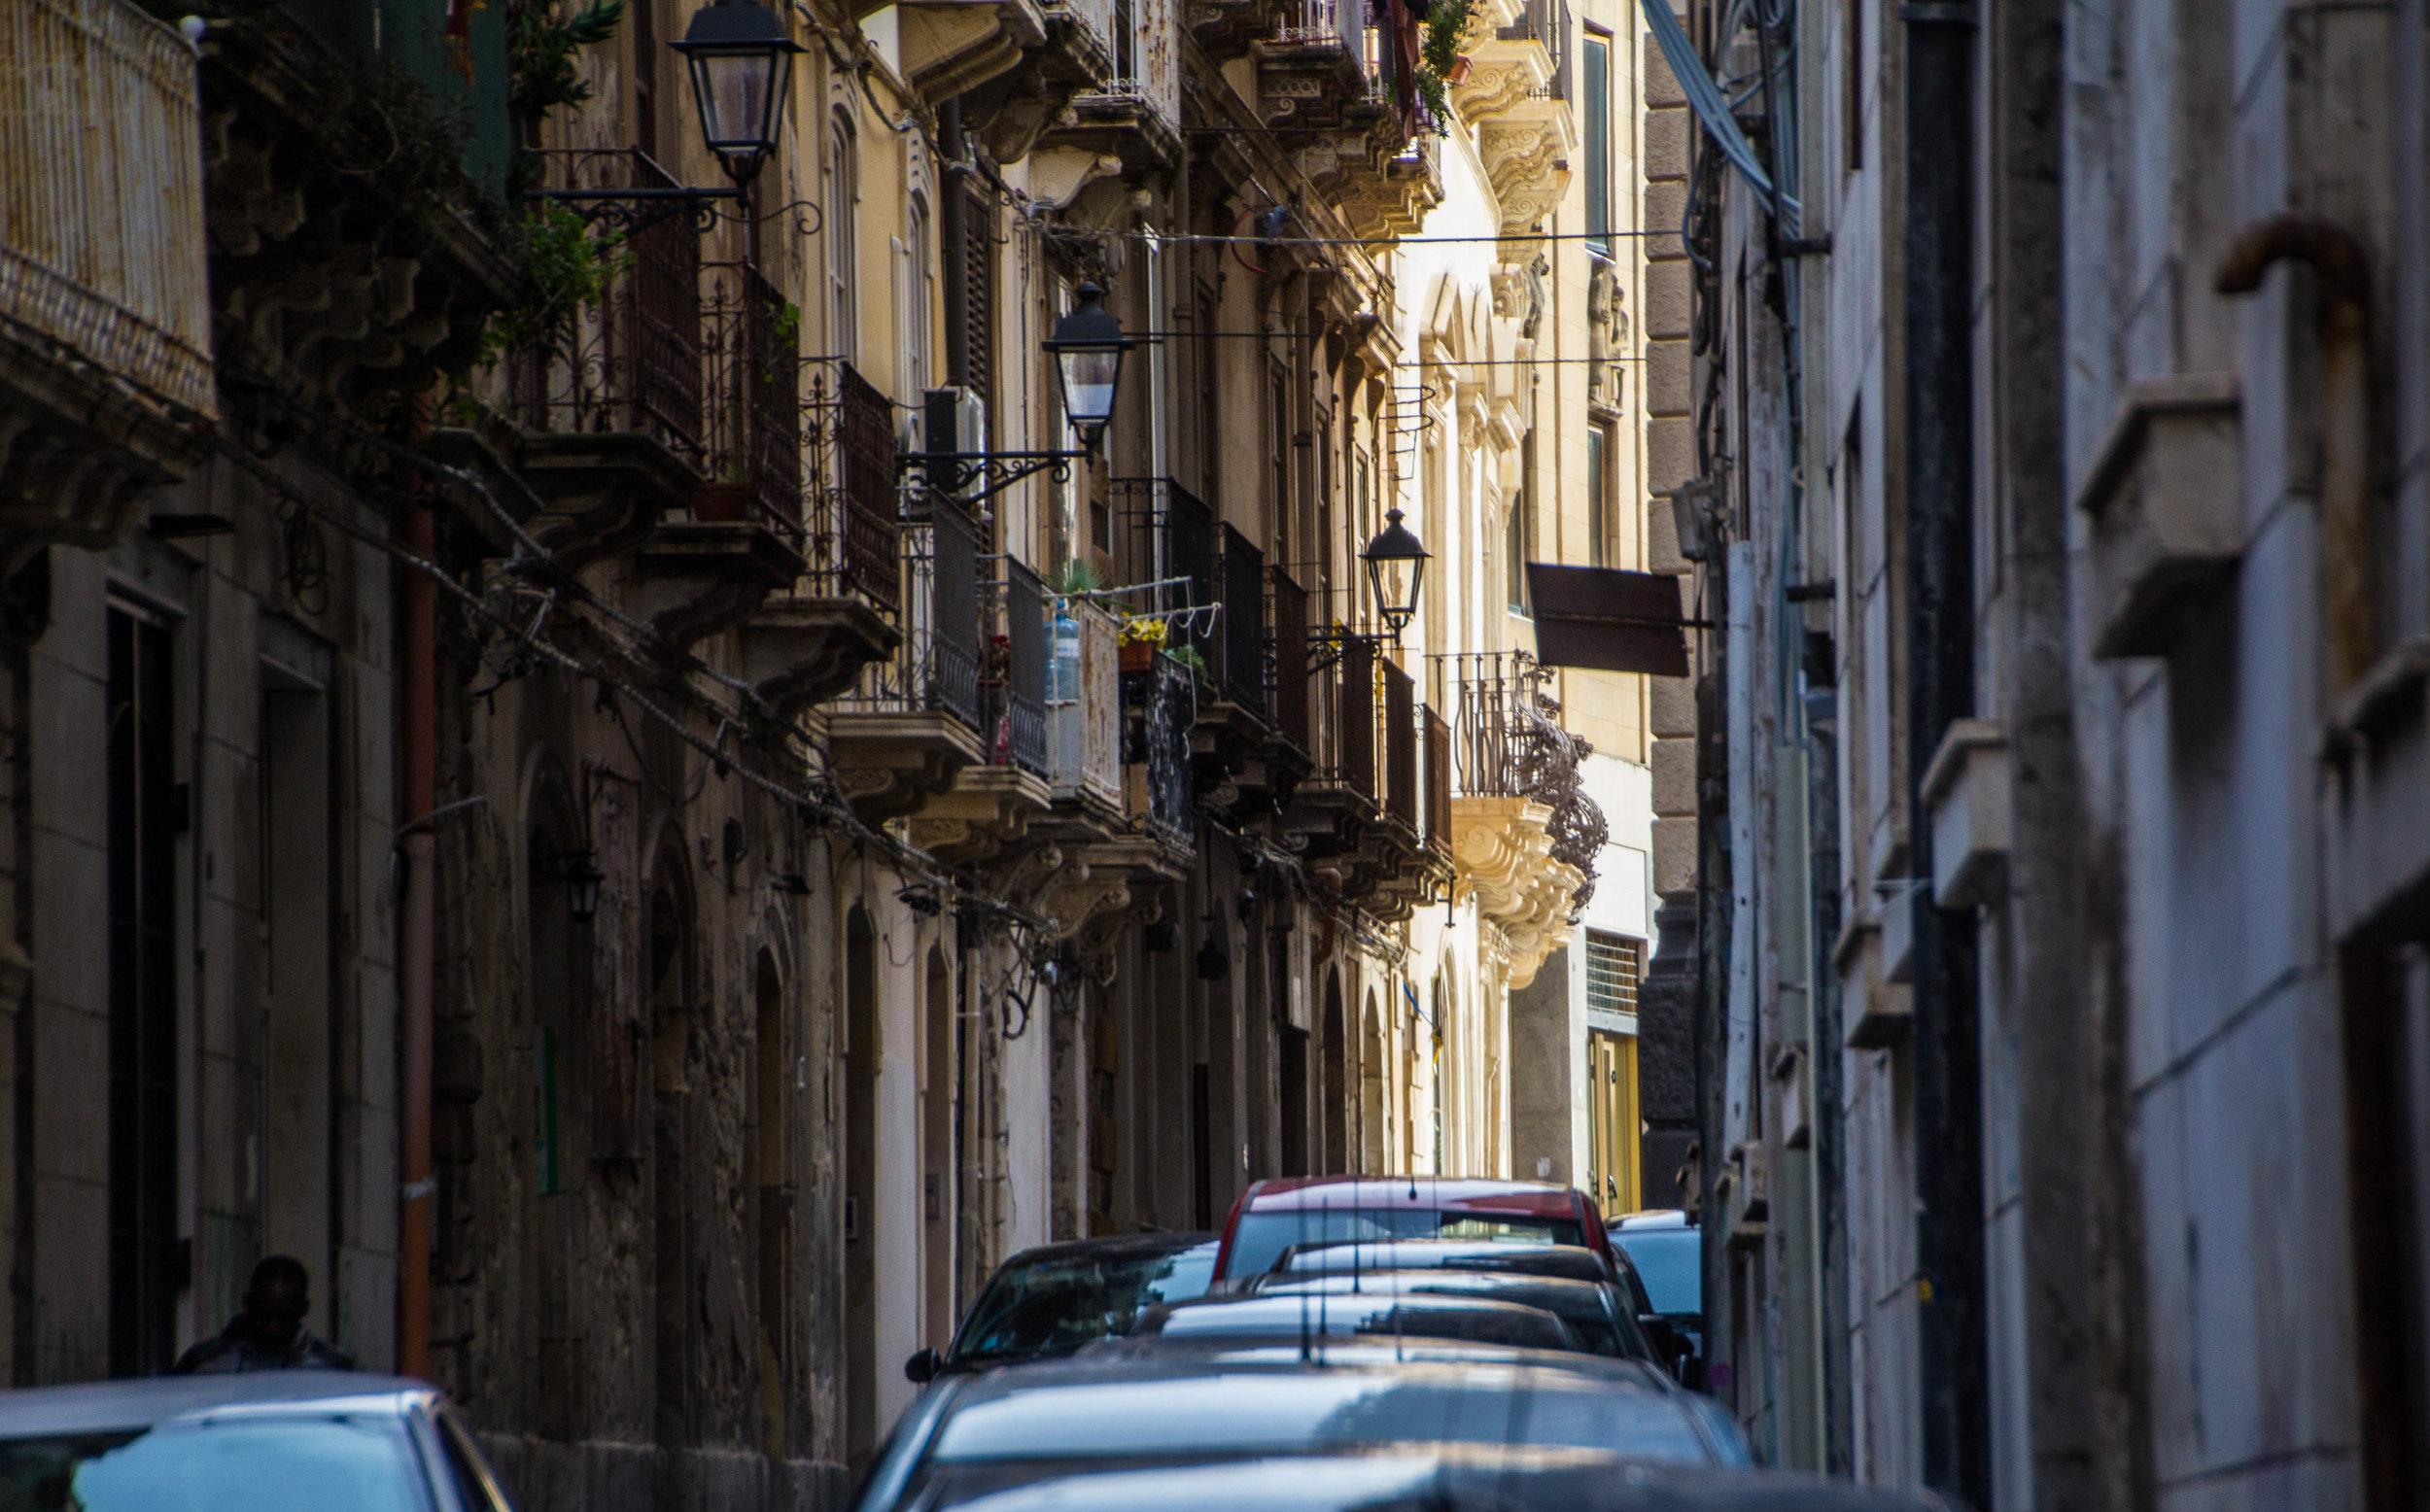 streets-ortygia-syracuse-sicily-52.jpg